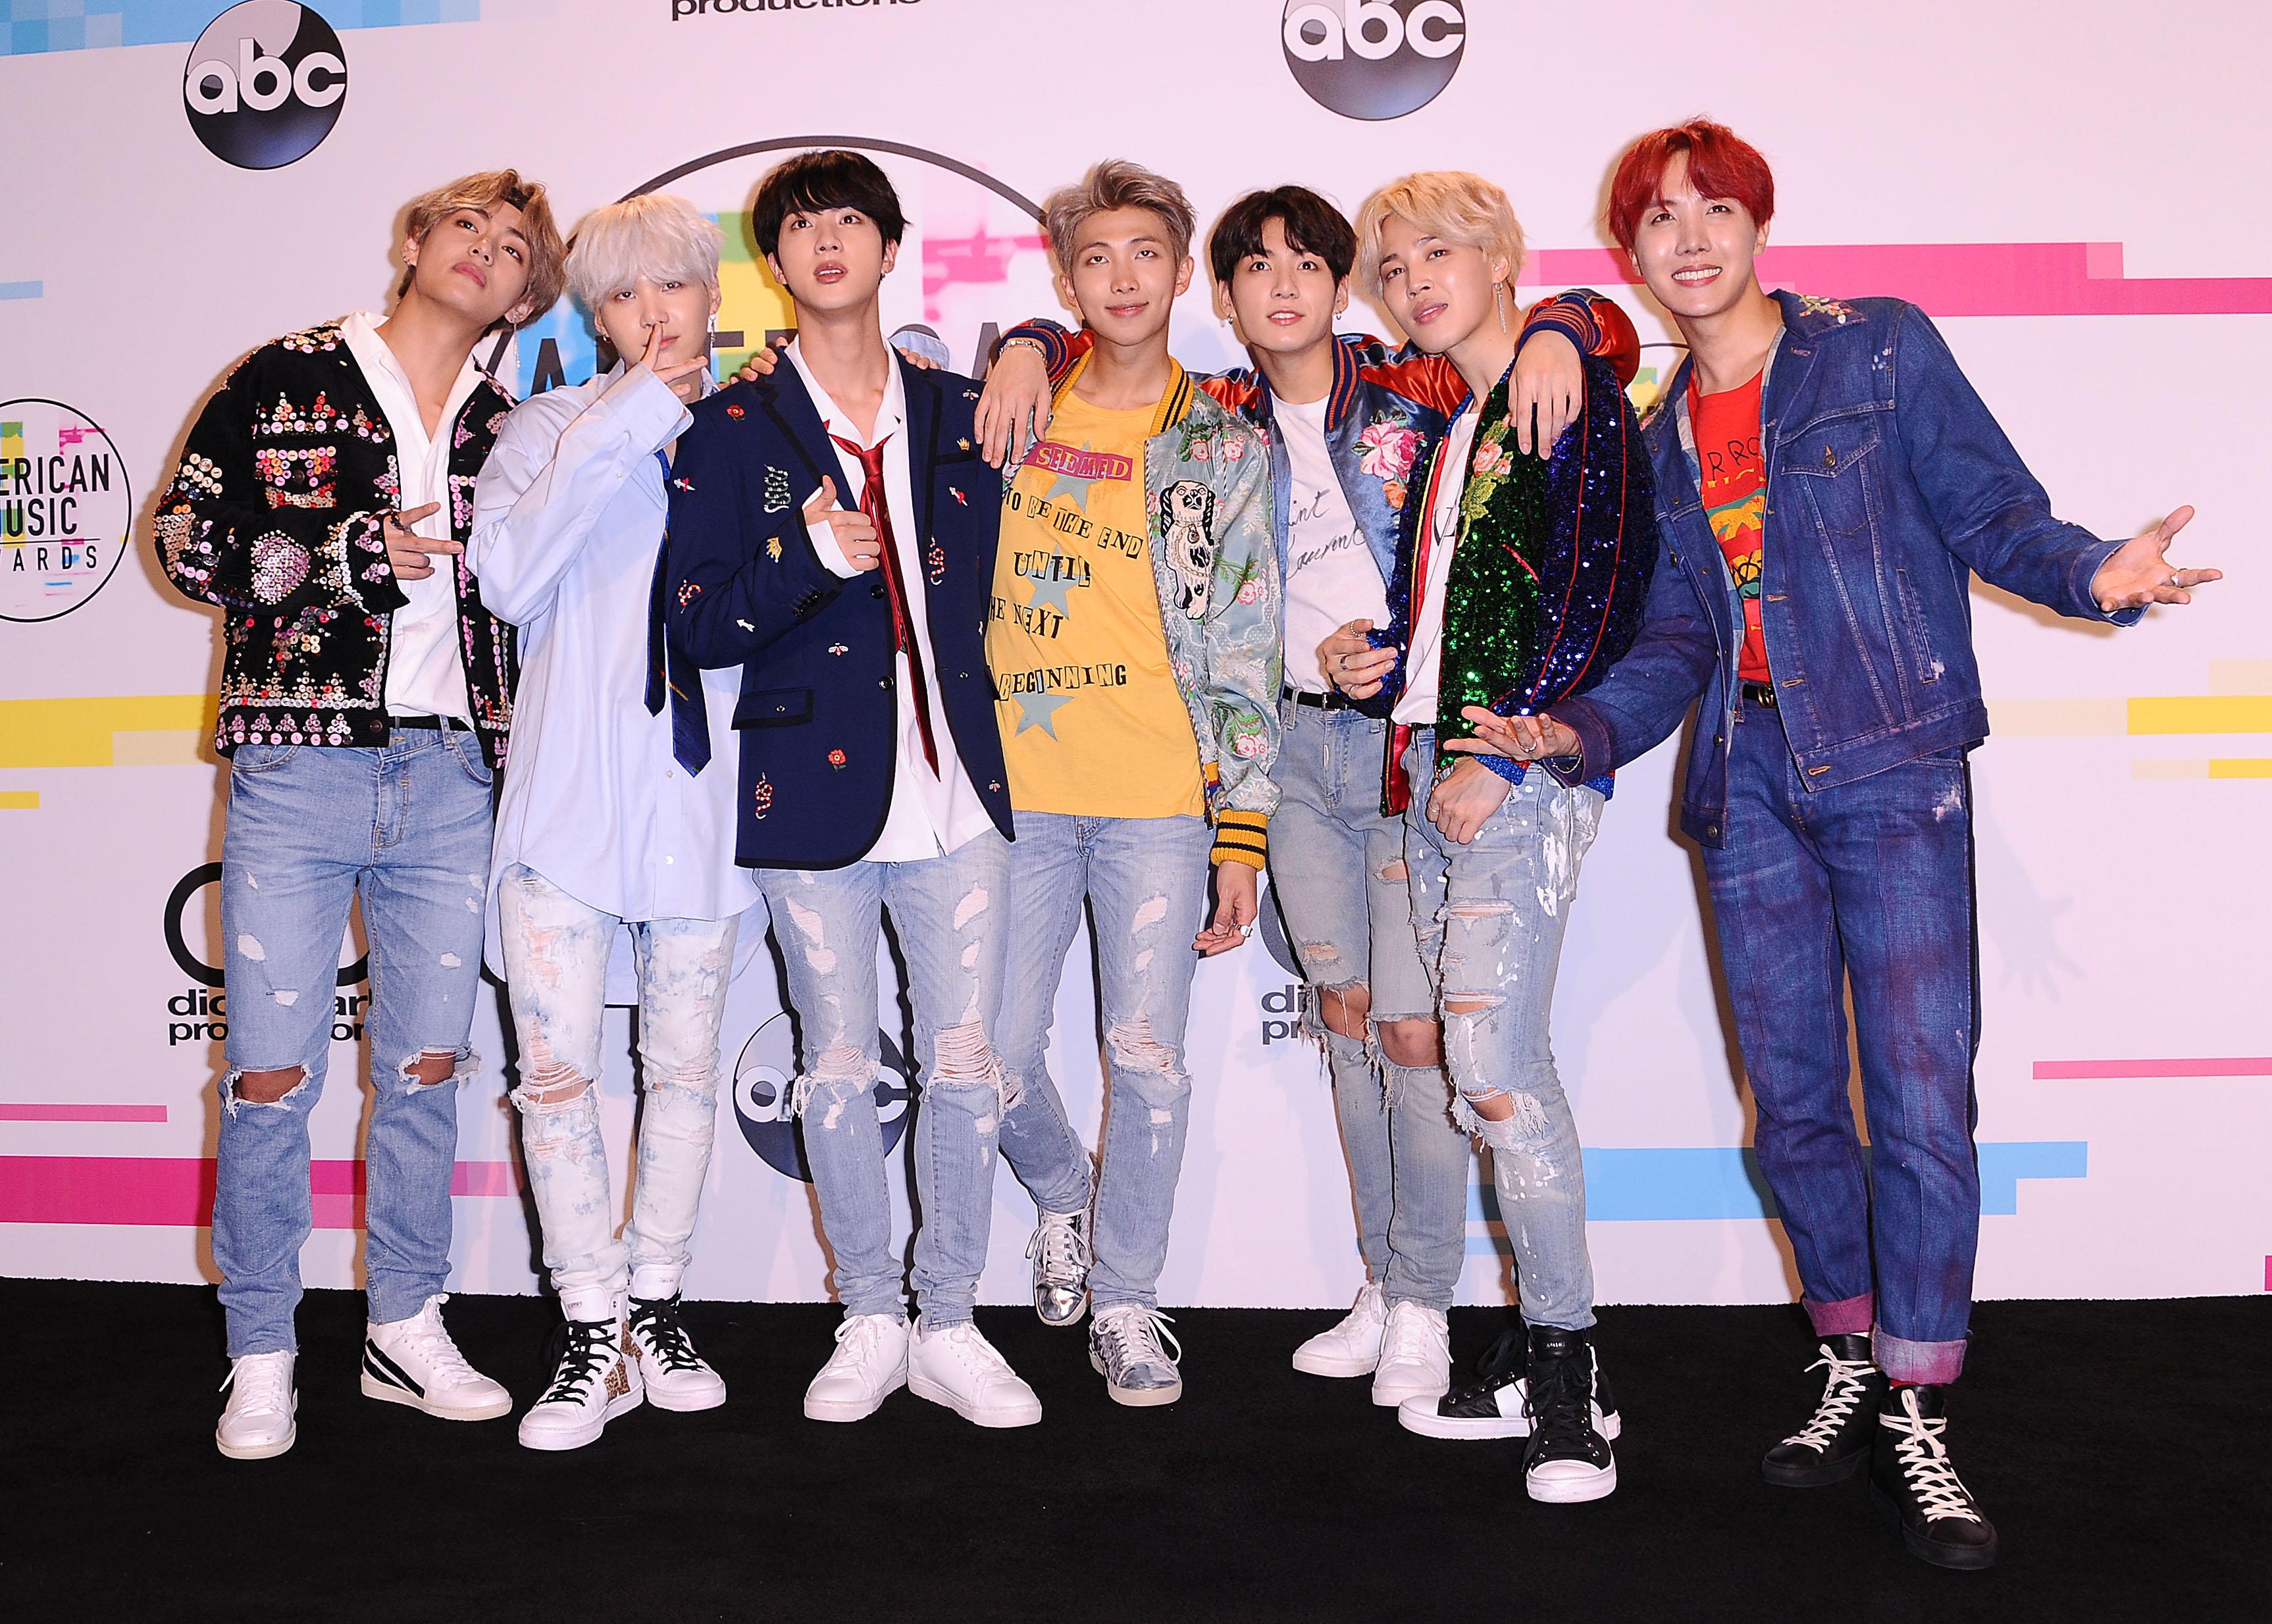 LOS ANGELES, CA - NOVEMBER 19:  BTS poses in the press room at the 2017 American Music Awards at Microsoft Theater on November 19, 2017 in Los Angeles, California.  (Photo by Jason LaVeris/FilmMagic)